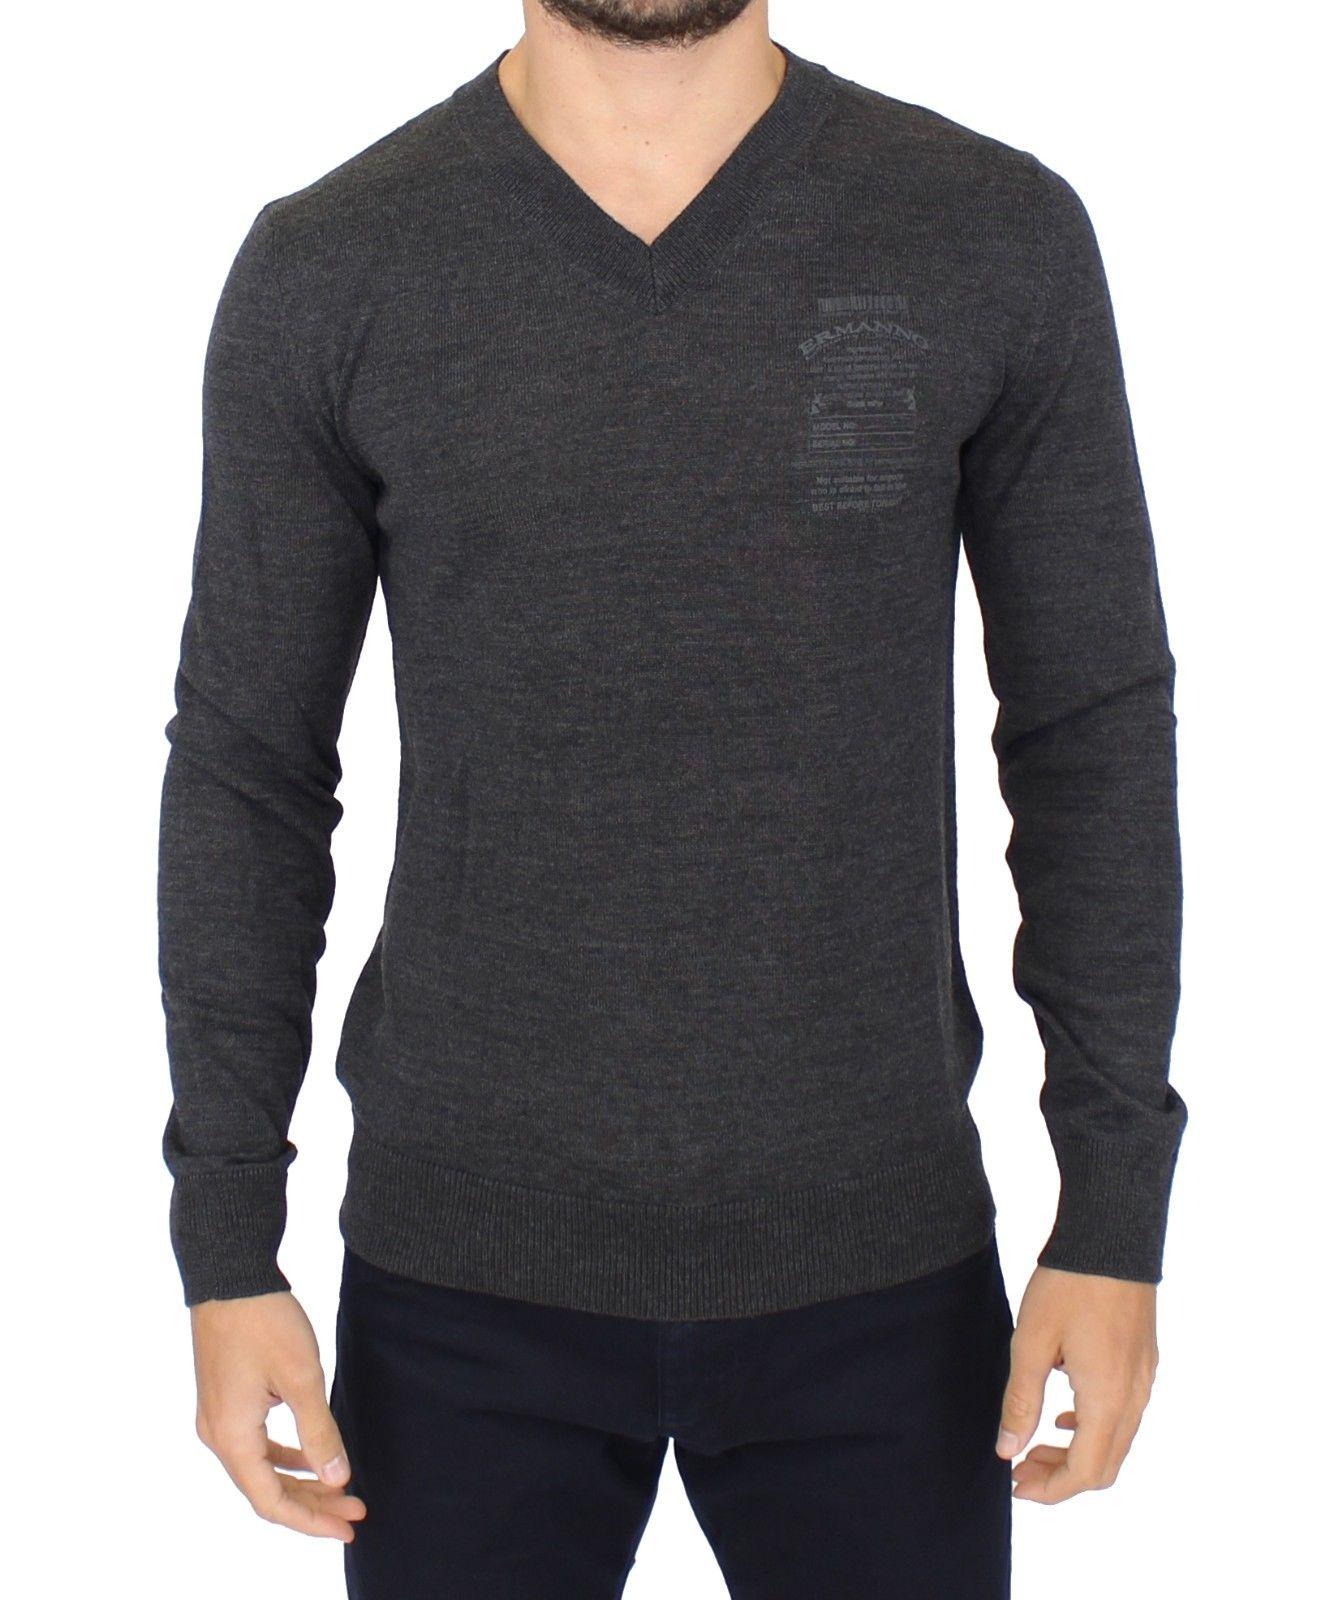 Ermanno Scervino Women's V-Neck Sweater Grey SIG10334 - IT58 | XXL